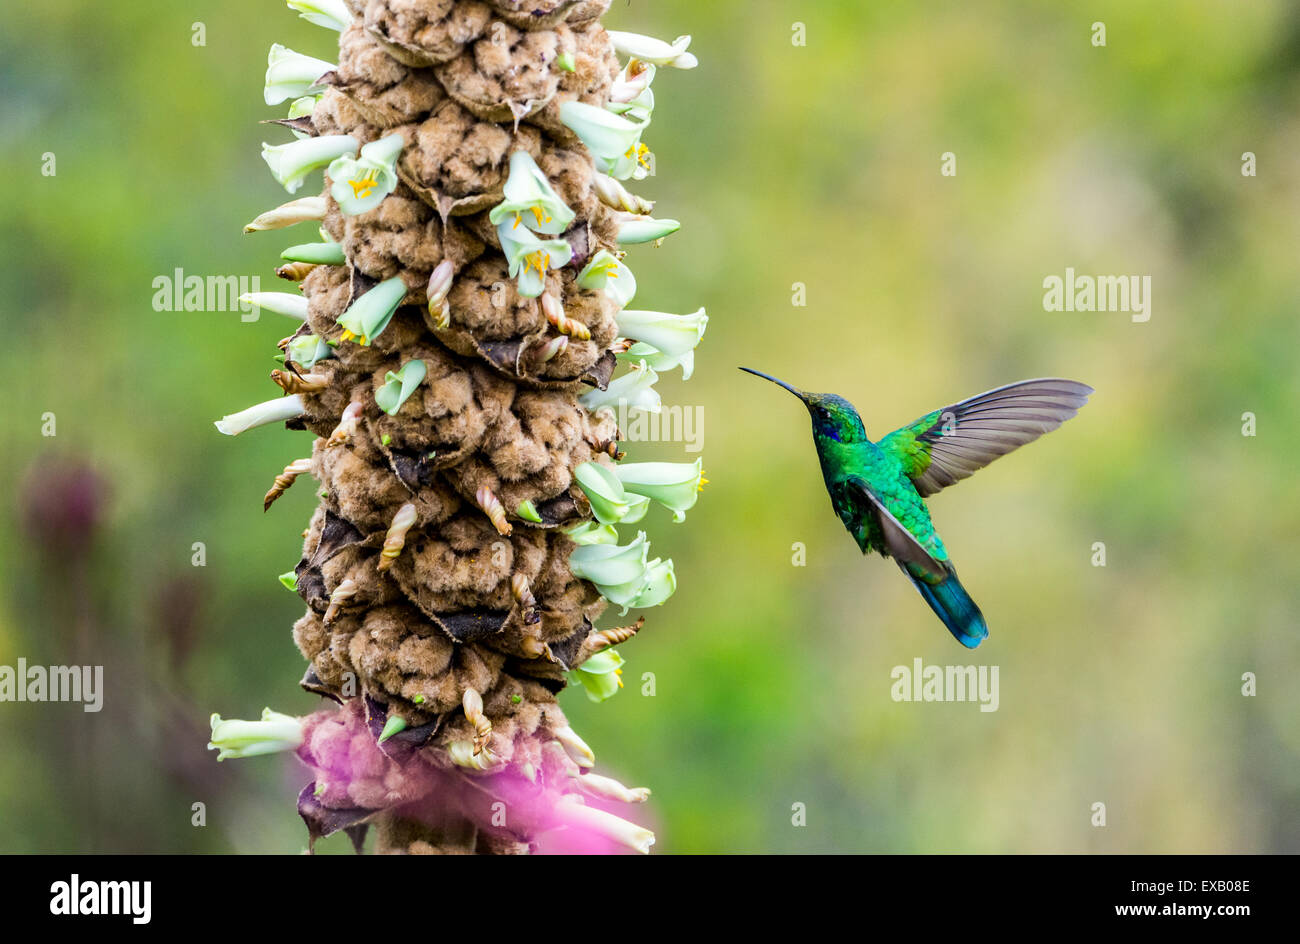 A Sparkling Violet-ear (Colibri coruscans) hummingbird feeding on wild flowers. Pululahua Geobotanic Reserve, Ecuador. Stock Photo